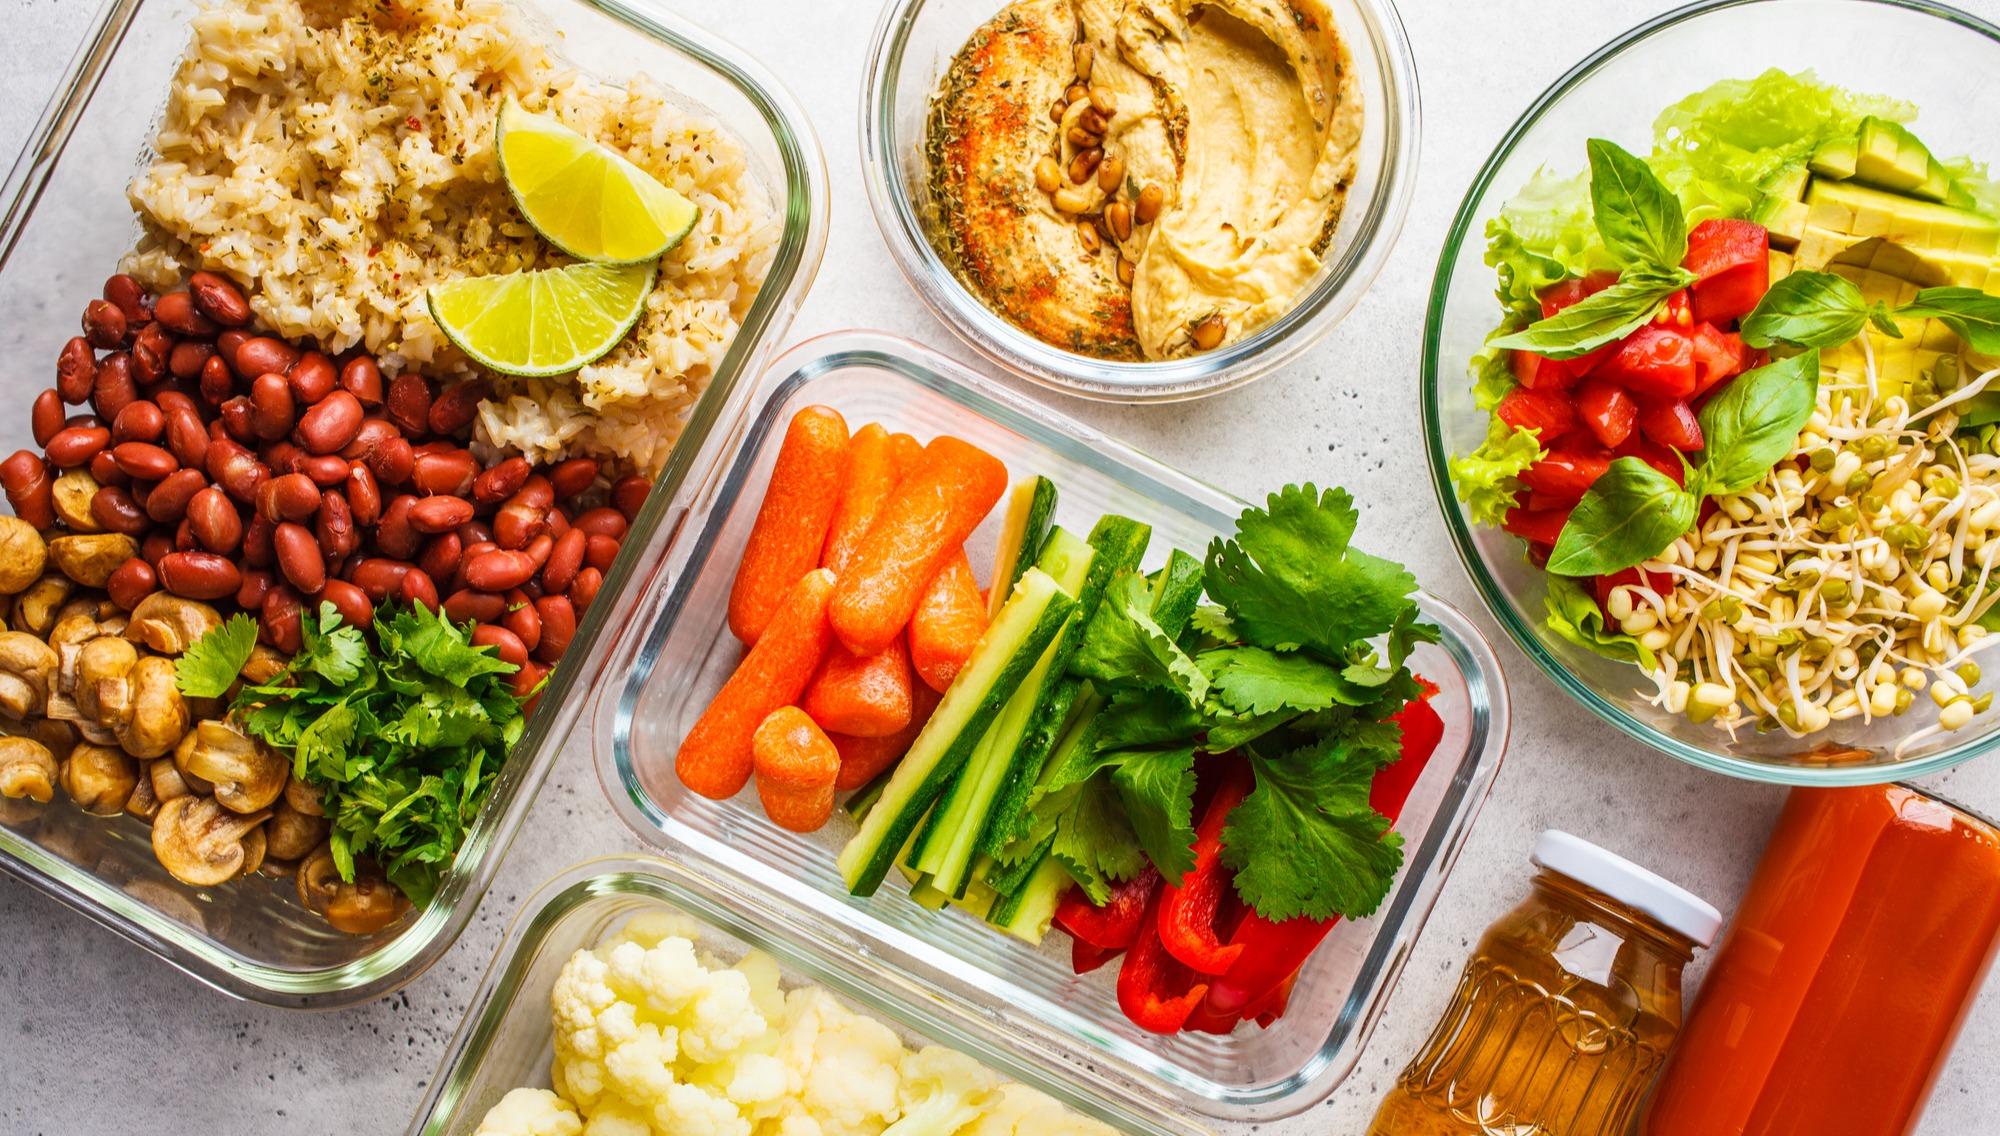 high-protein-vegan-foods-list-1